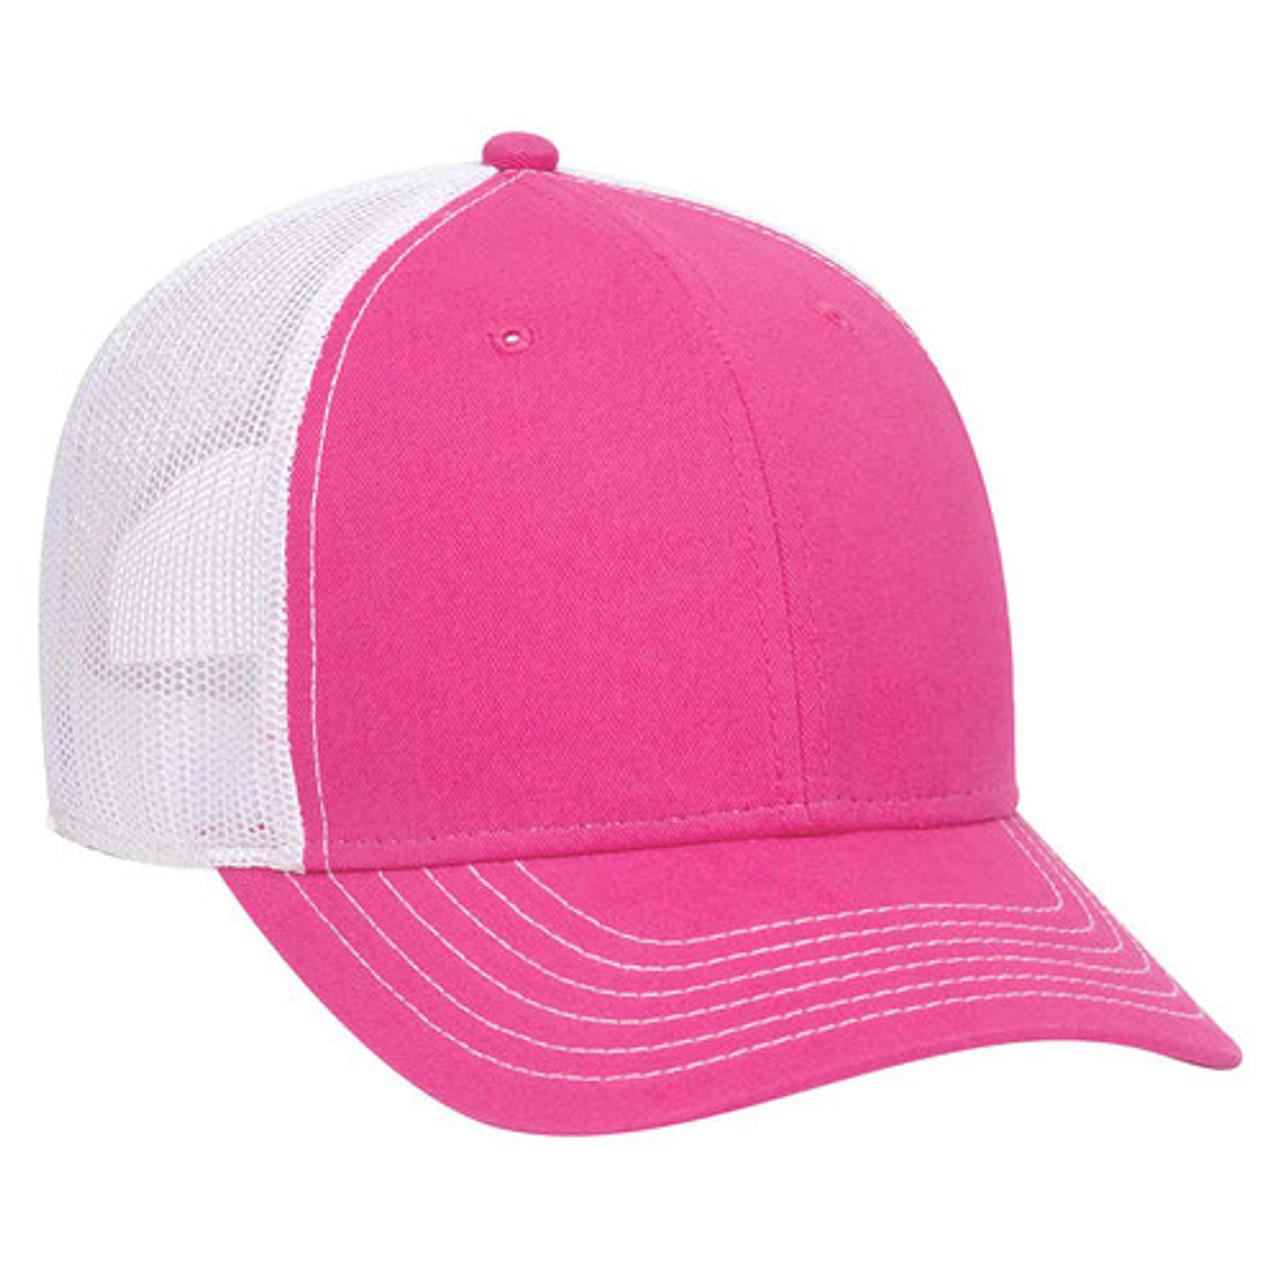 Custom Low Profile Mesh Back Trucker Hats